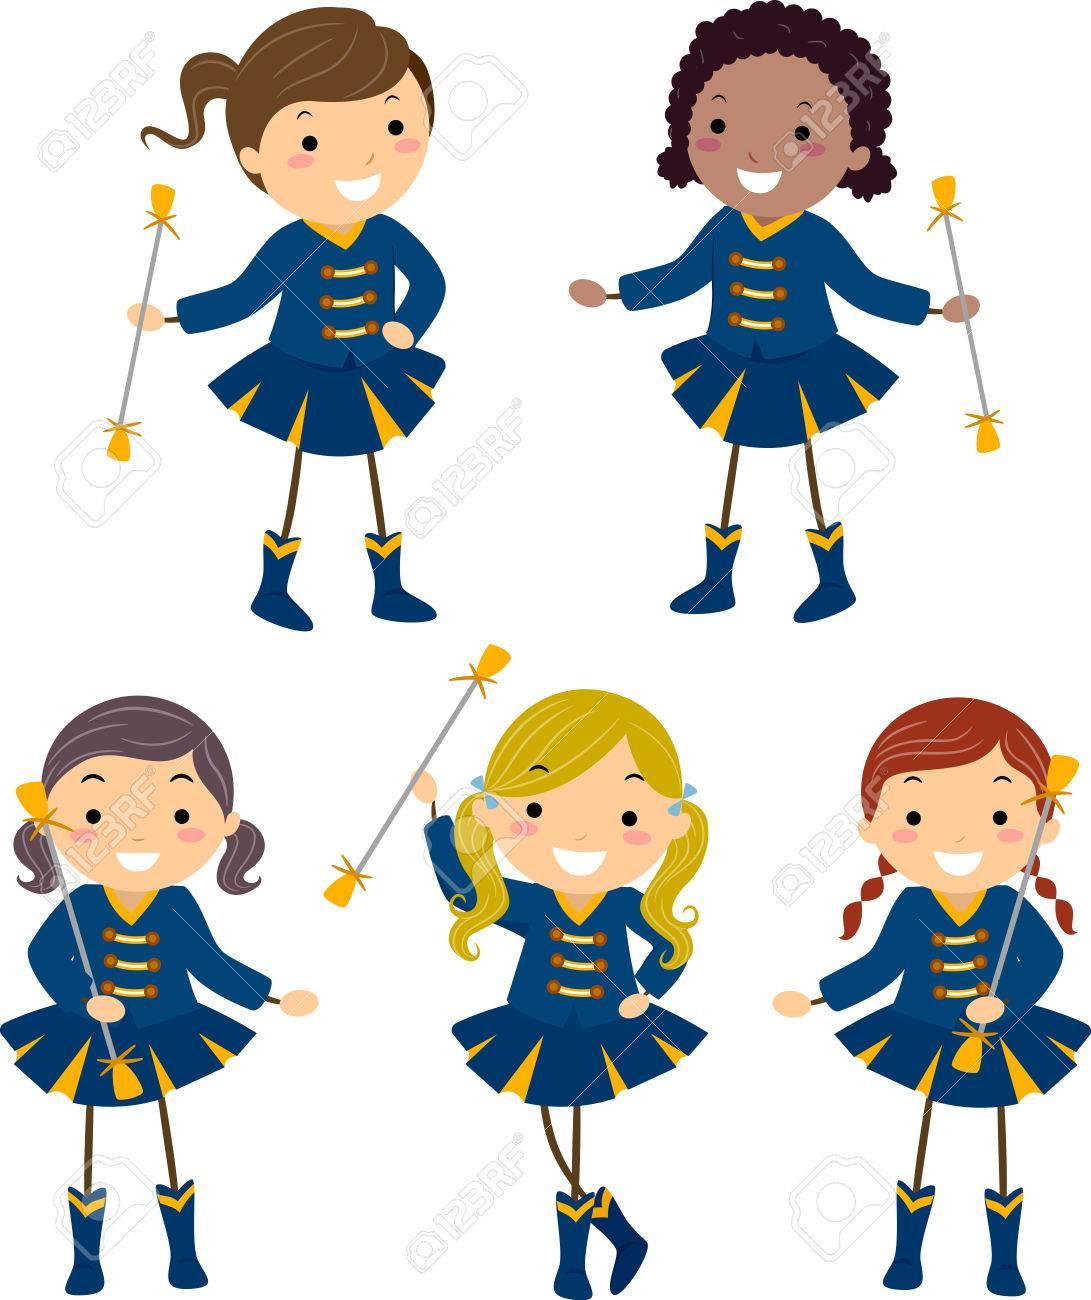 Illustration of Stickman Kids in Majorette Uniforms in Different...